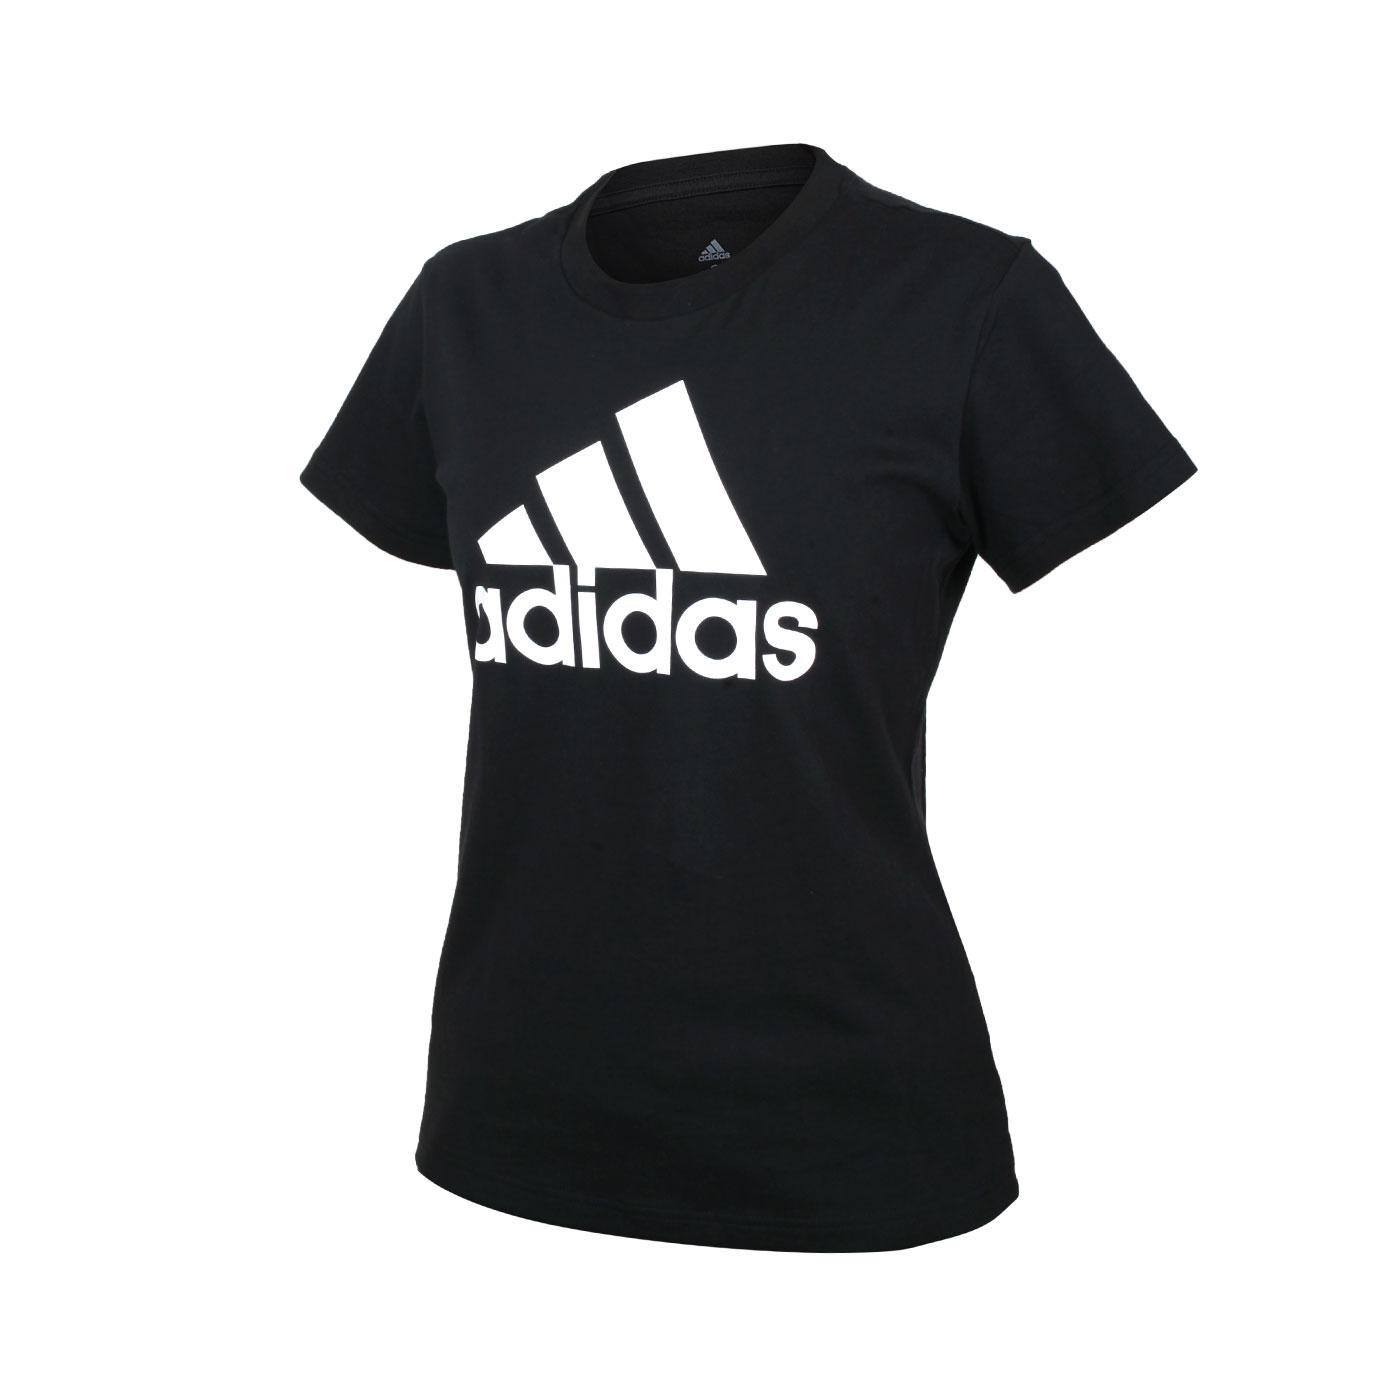 ADIDAS 女款短袖T恤 GL0722